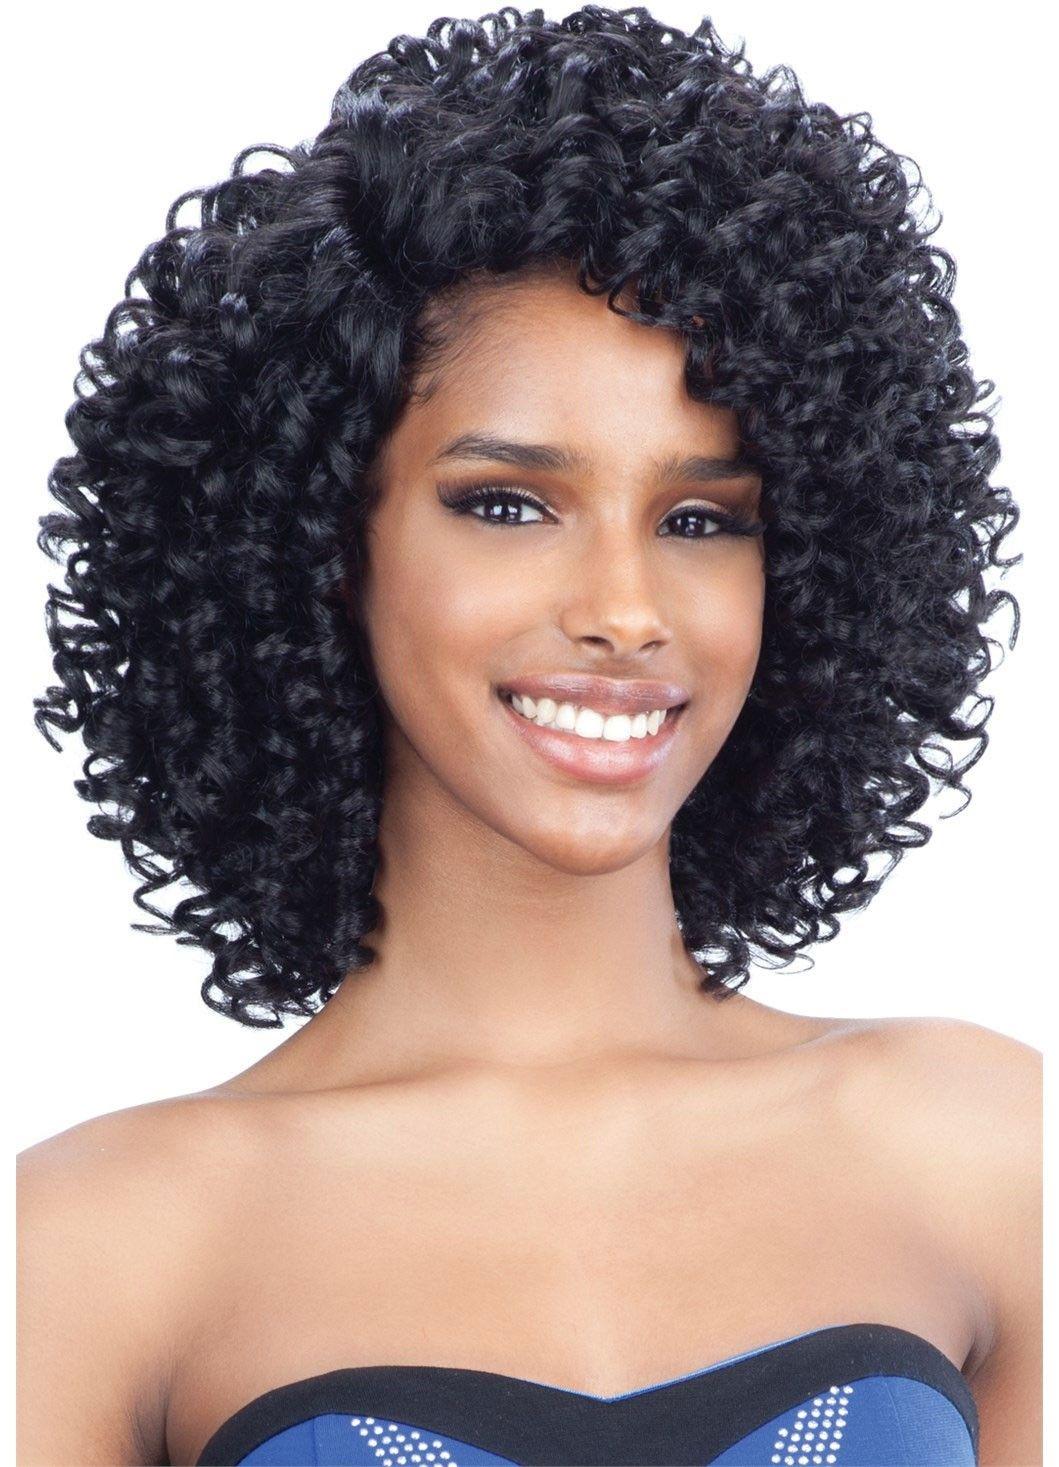 Model Model Extreme Side LPart Wig ATLAS Braided